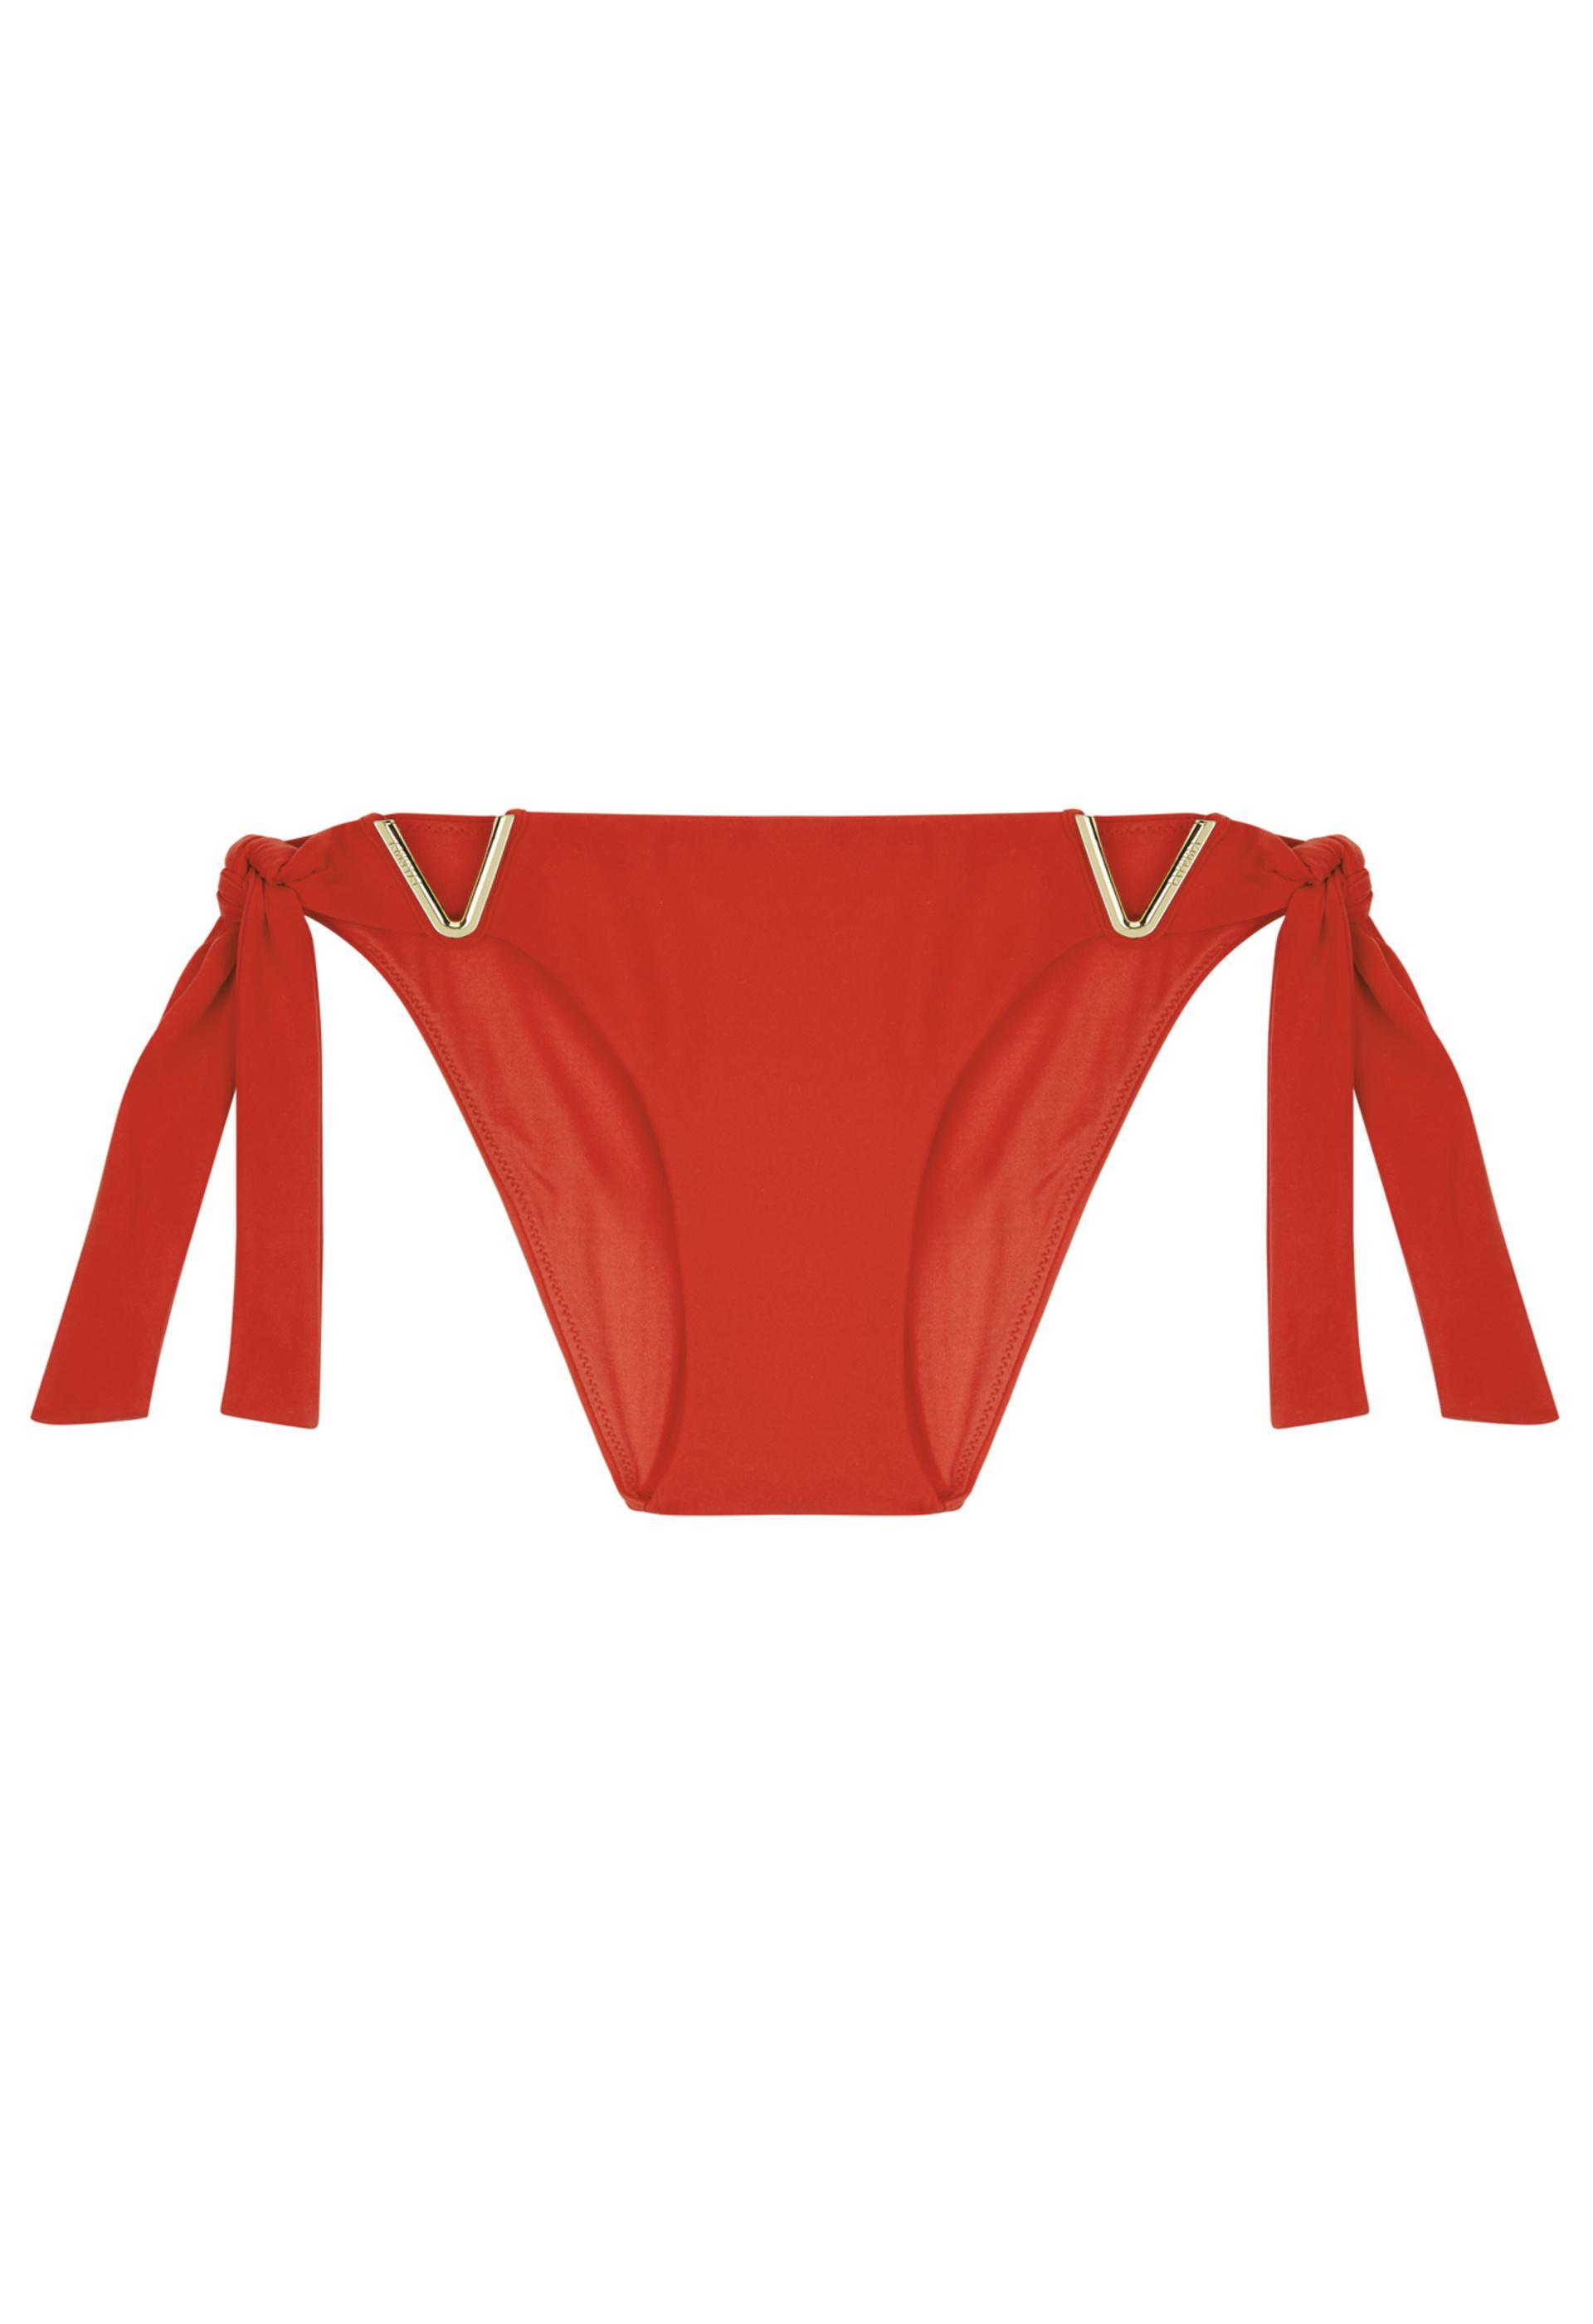 b8c61865690f5 Lyst - La Perla Aquamarine Tango Red Side-tie Bikini Briefs With  v ...